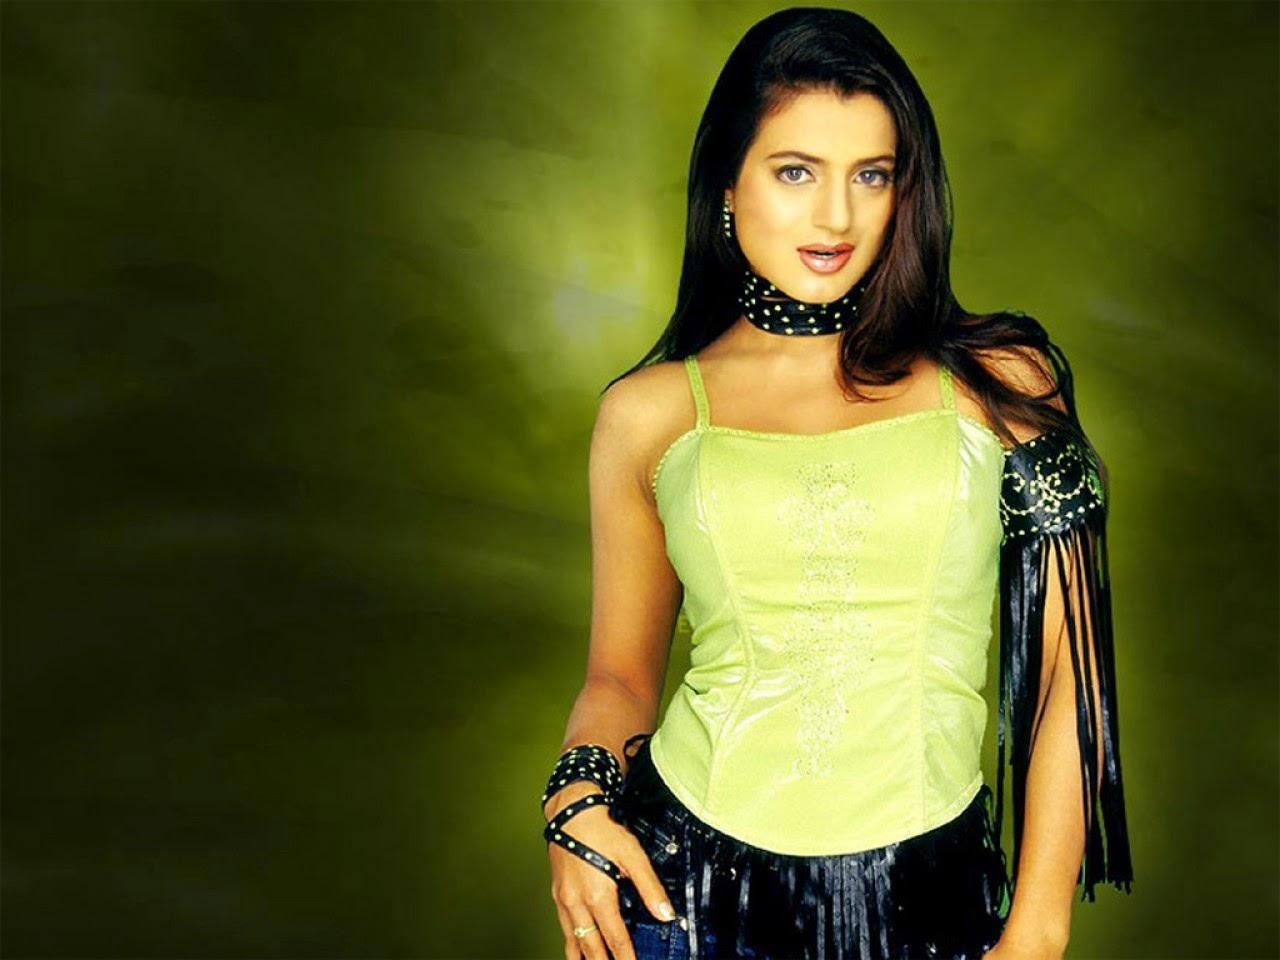 950x1534 Ameesha Patel In Tie Photos 950x1534 Resolution